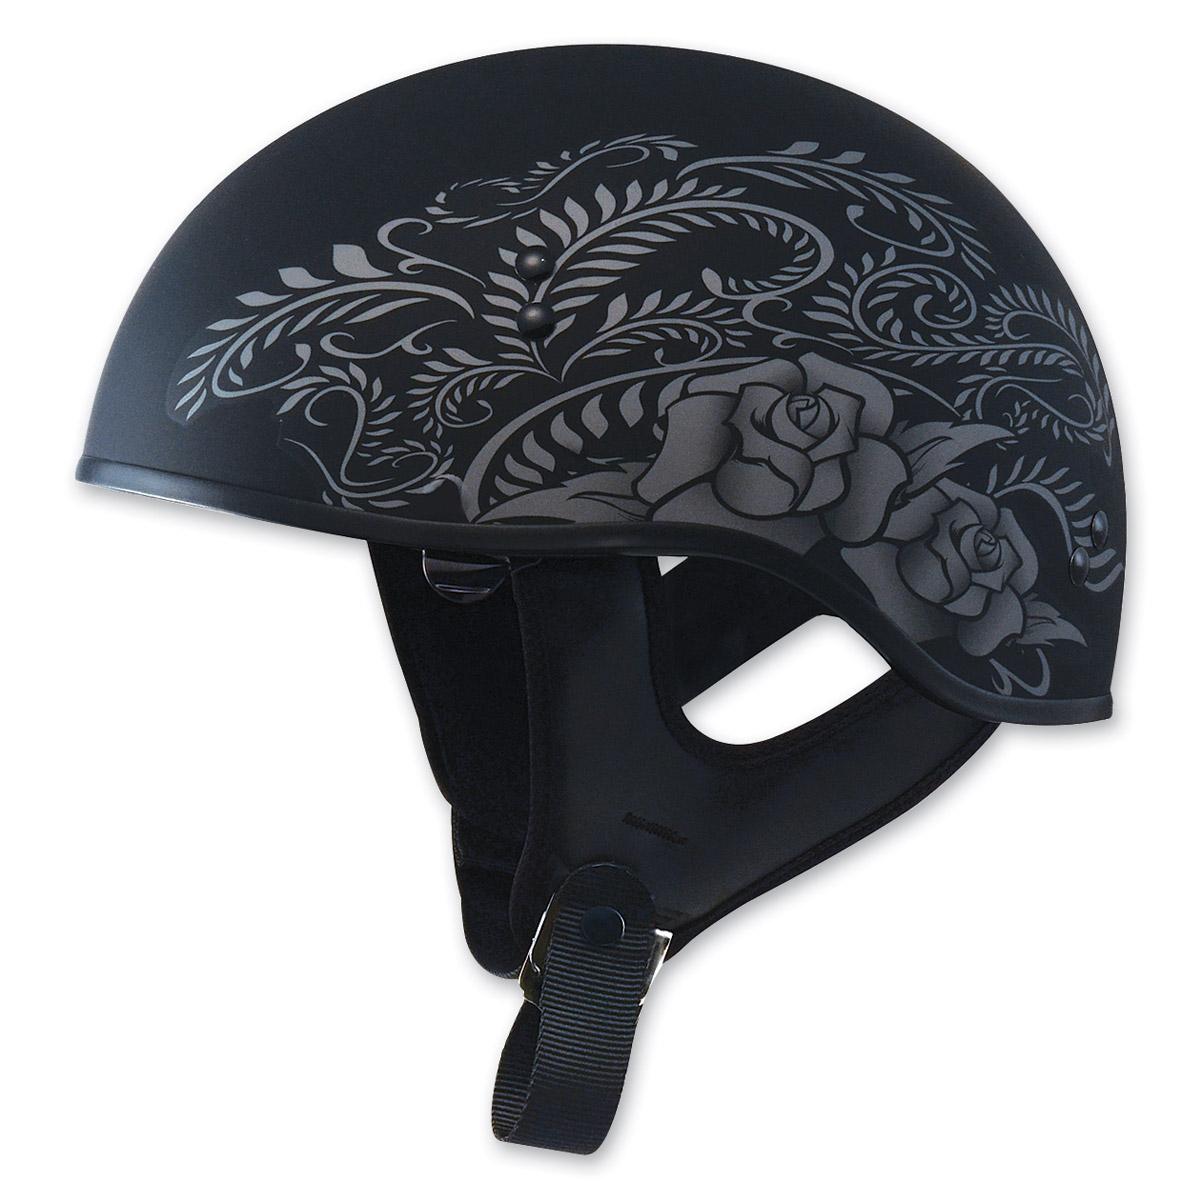 Motorcycle Helmets Melbourne